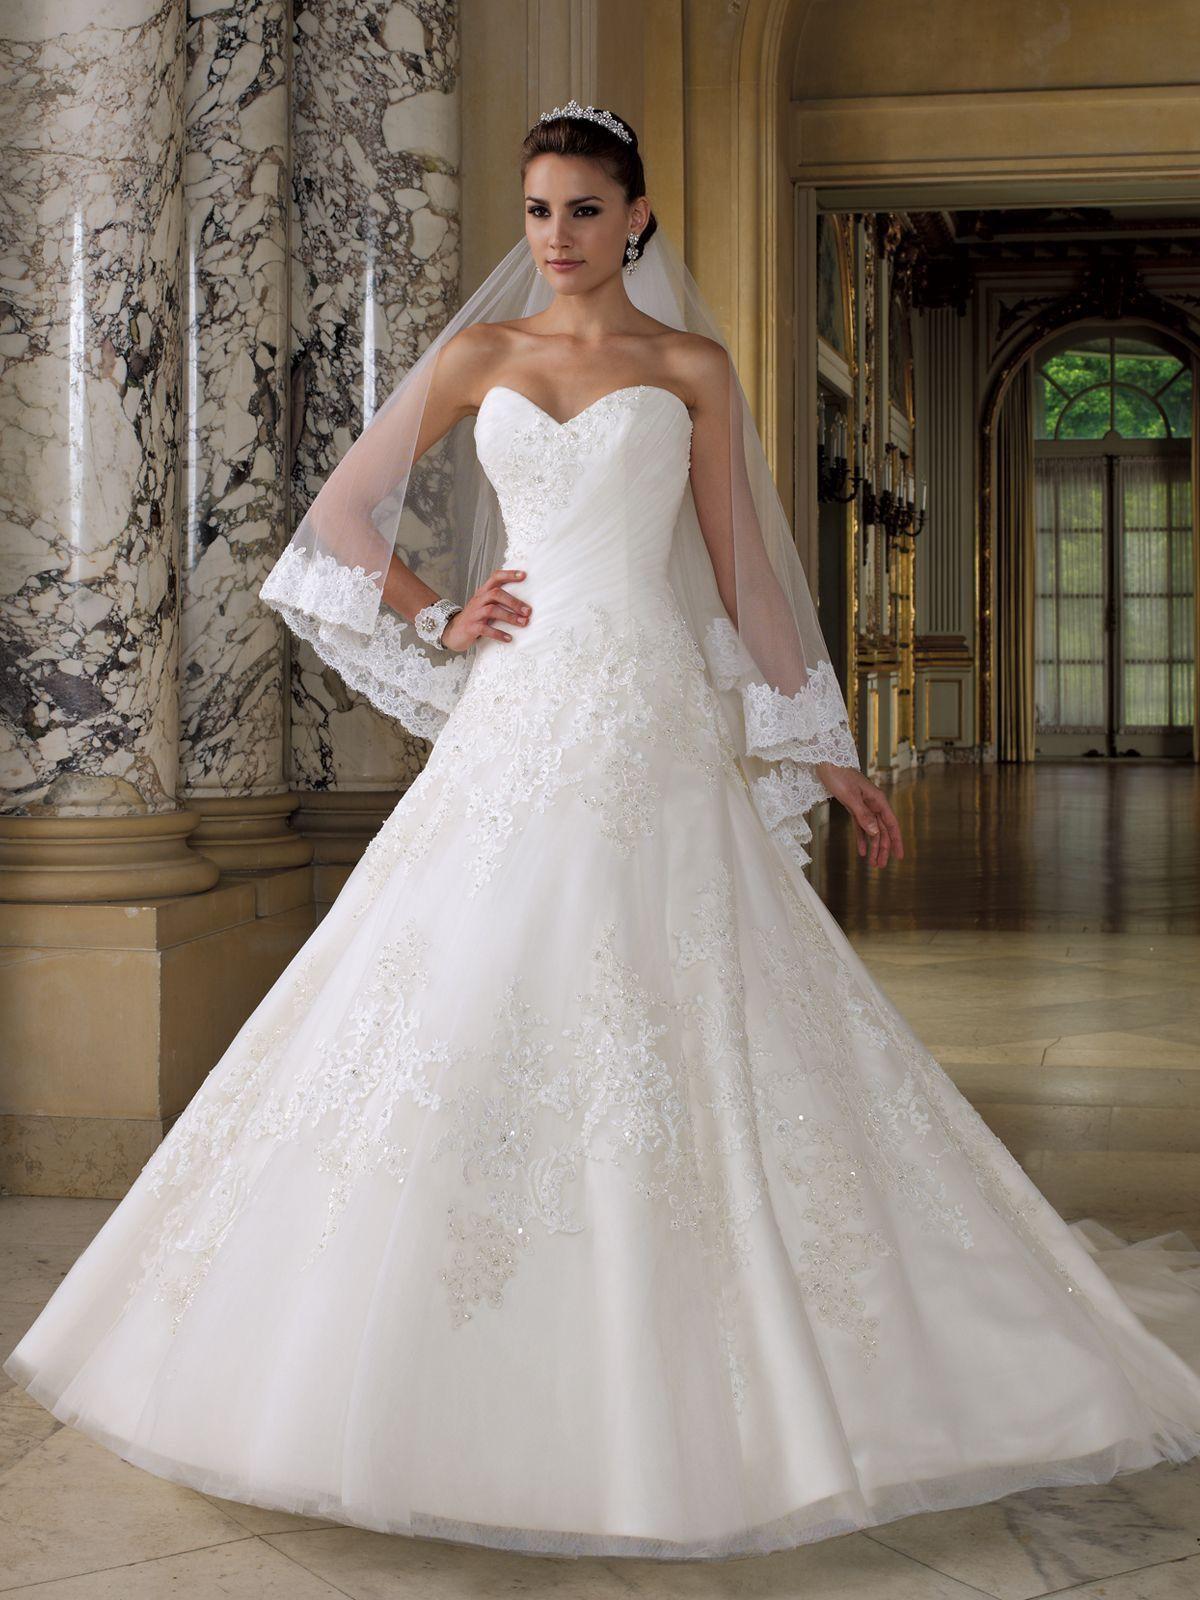 Cheap A Line Wedding Dress Buy Quality Fashion Directly From China Suppliers Vestidos De Novia Vintage Dresses